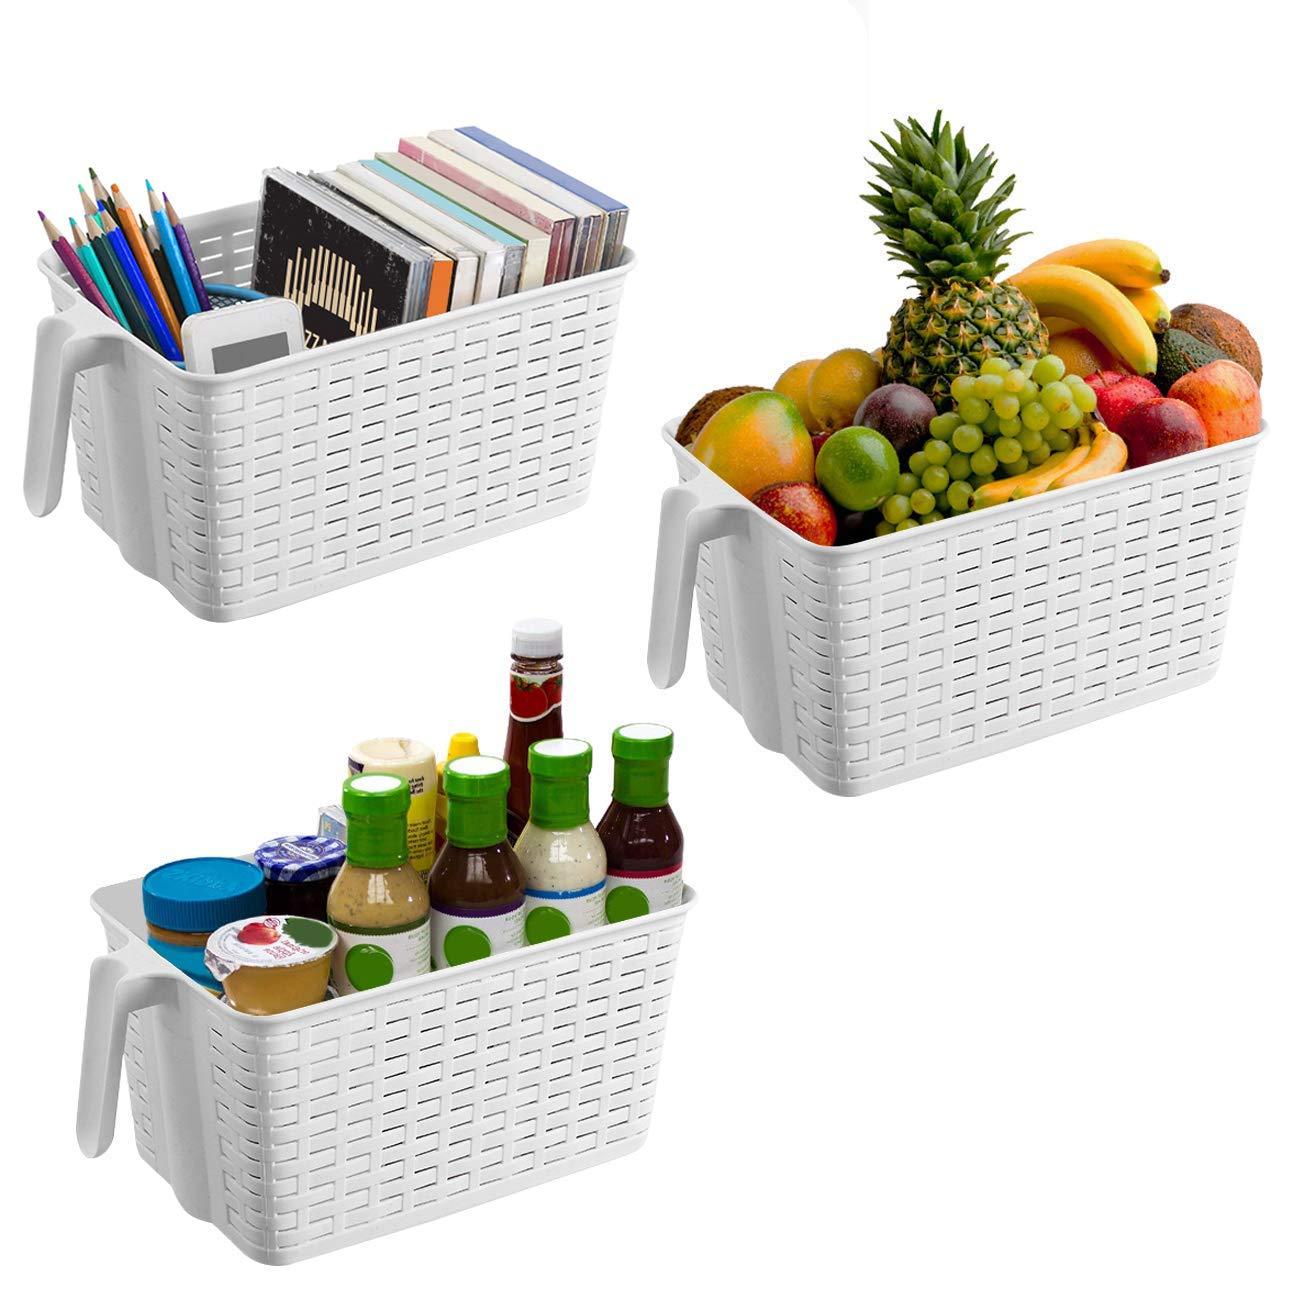 Kurtzy 3 Pack (30x19x14.5 cm) White Plastic Storage Basket - Stationary Organizer, Kitchen Pantry storage organisers, Cupboard, Refrigerator Storage Basket with Handle.